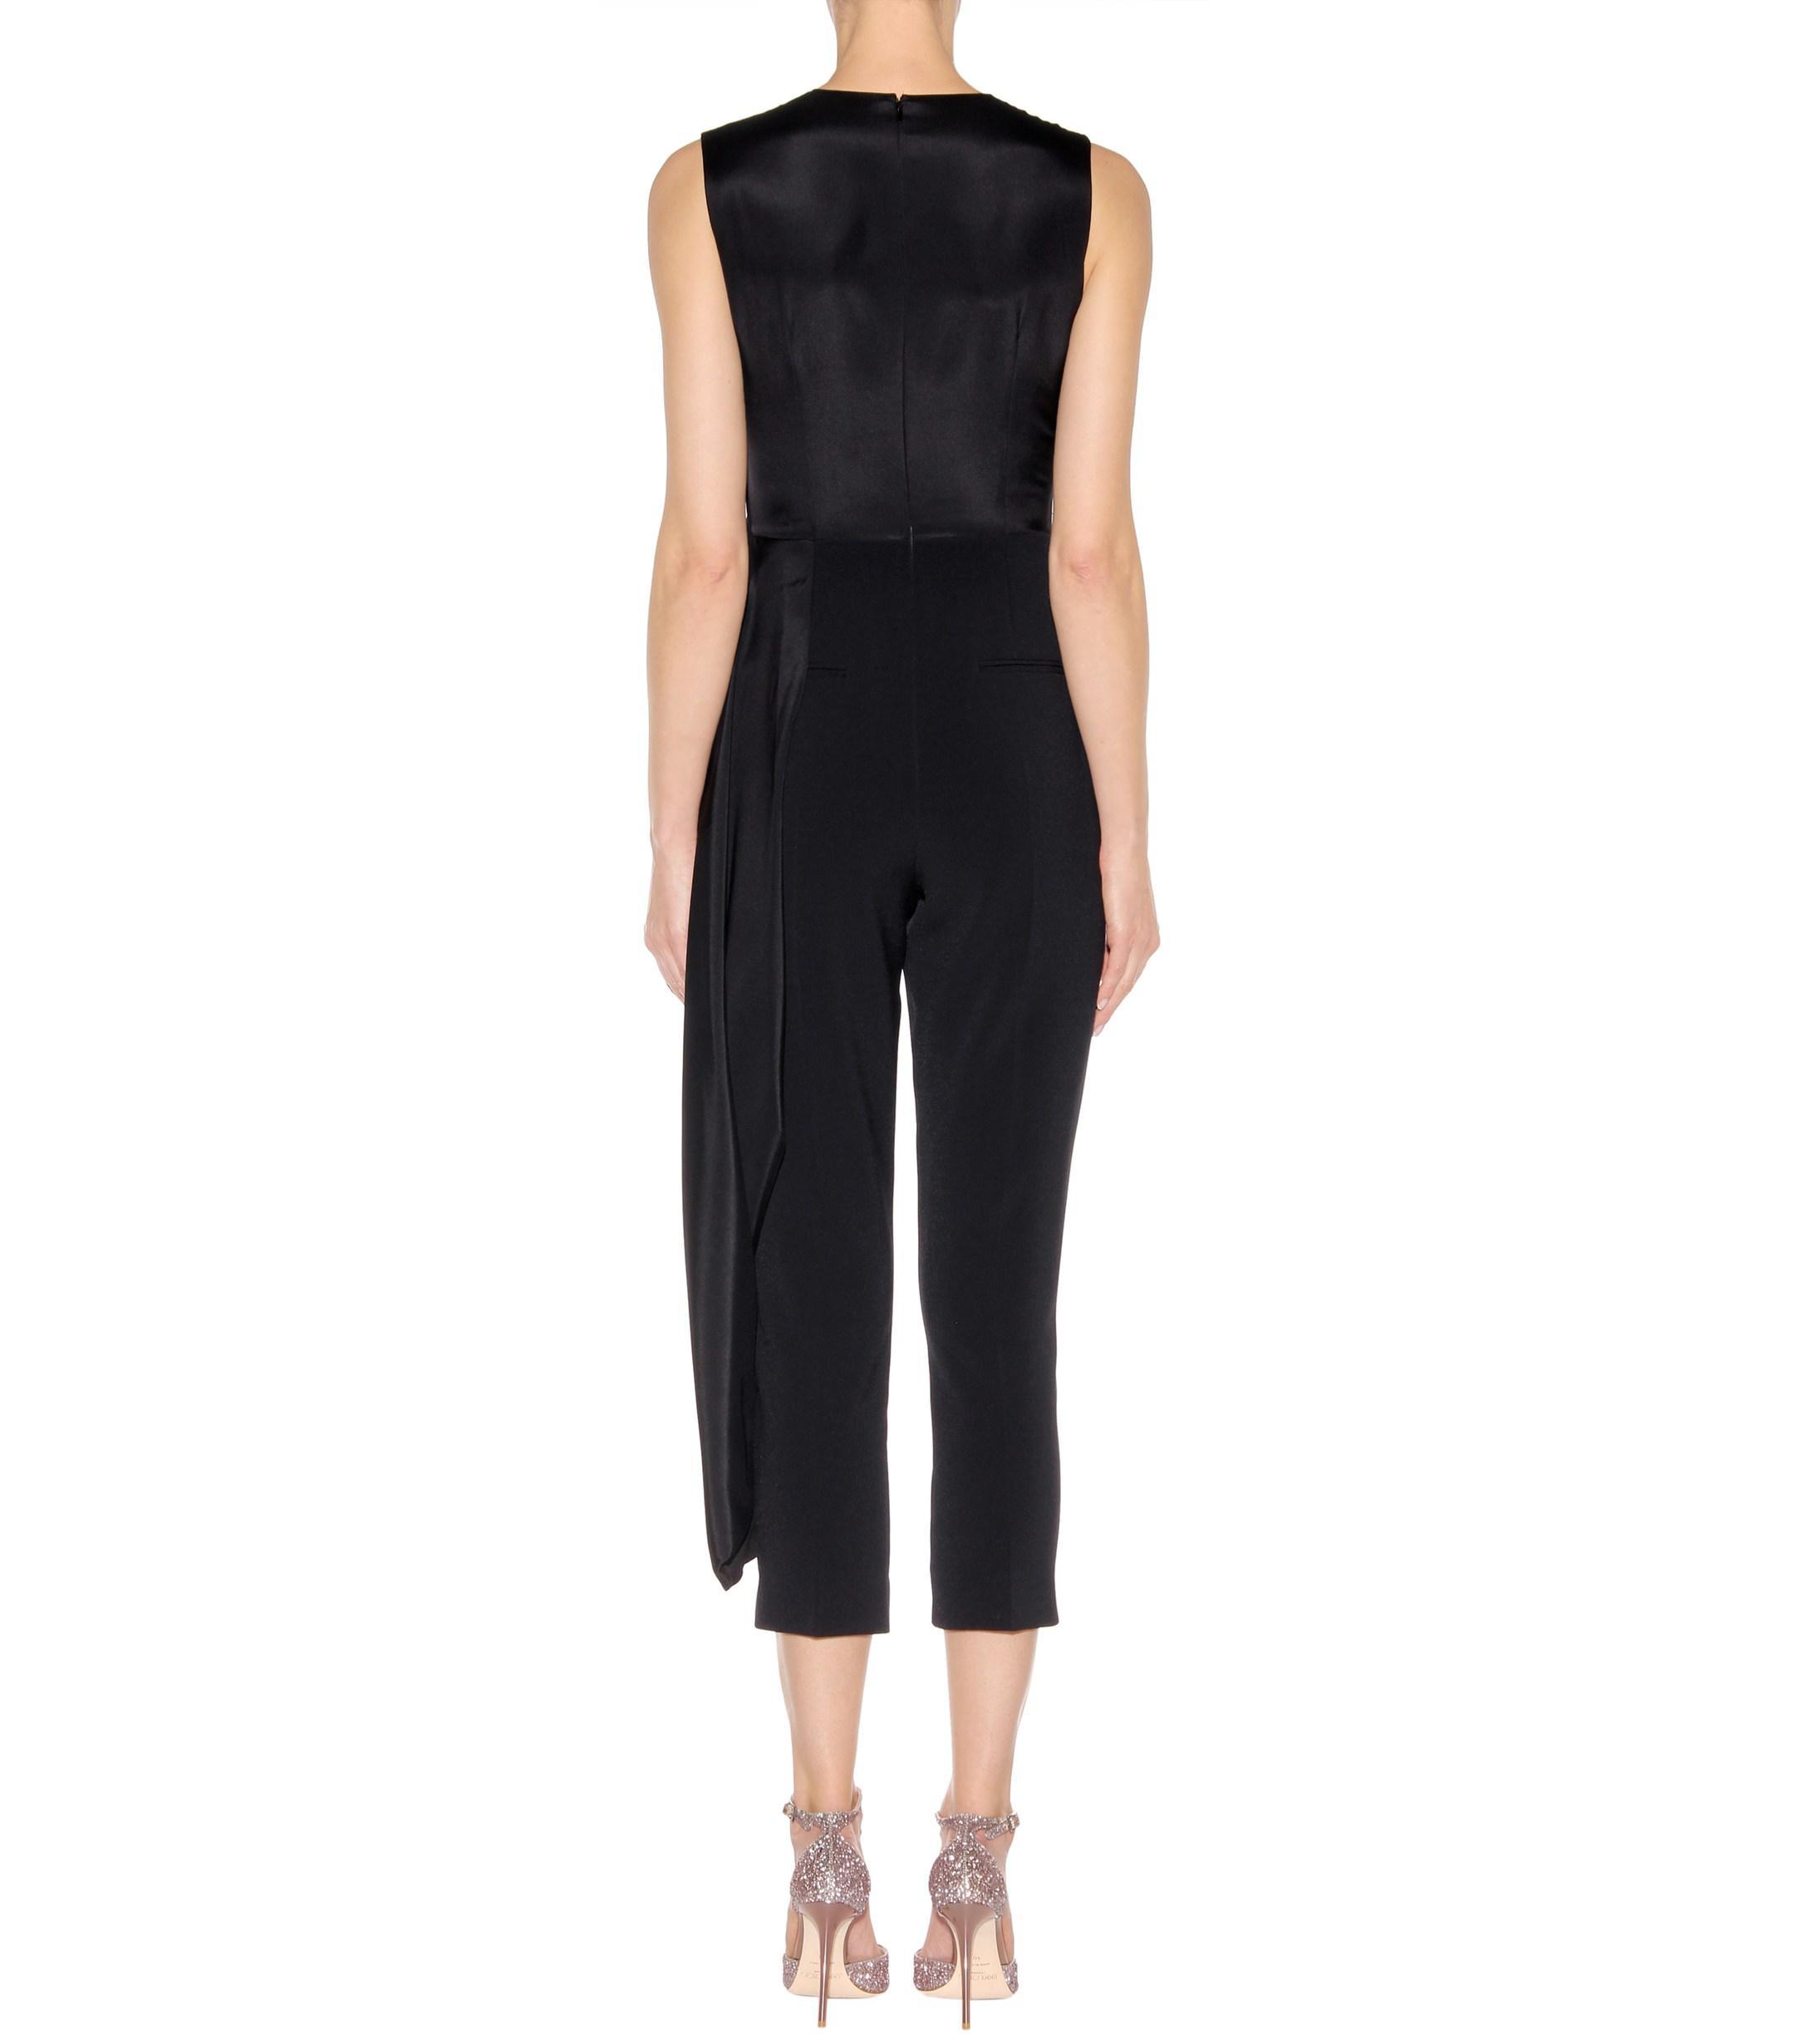 dc968d62da26 Roksanda - Black Thurloe Cut-out Jersey And Crêpe Jumpsuit - Lyst. View  fullscreen